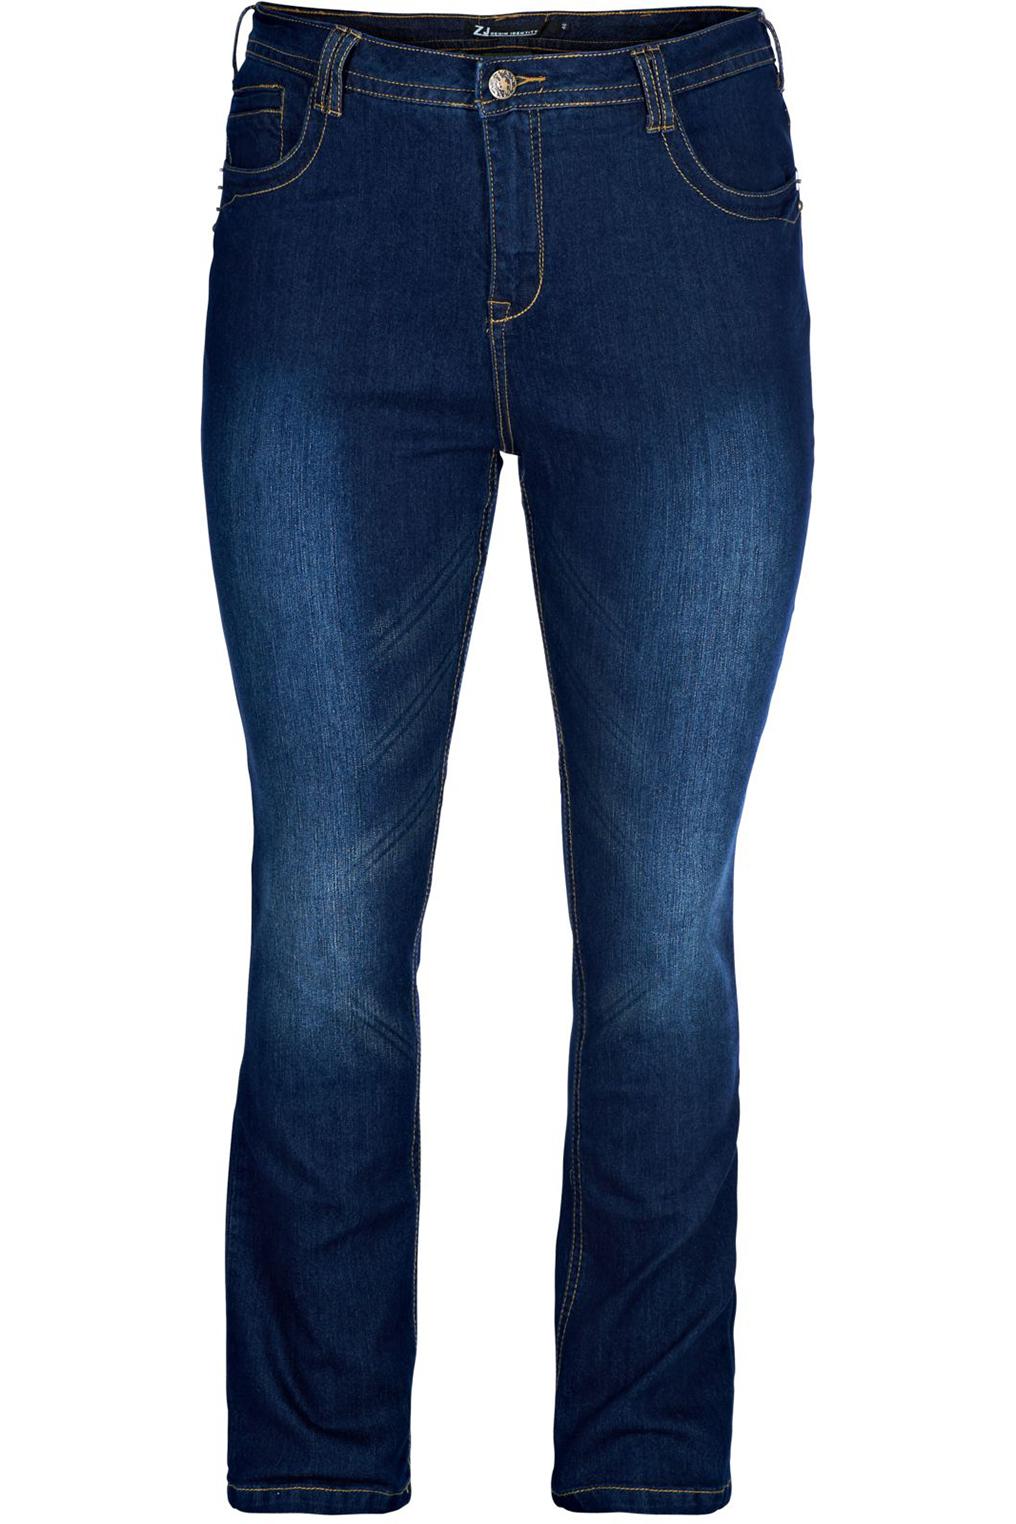 Jeans Zizzi Molly normal fit